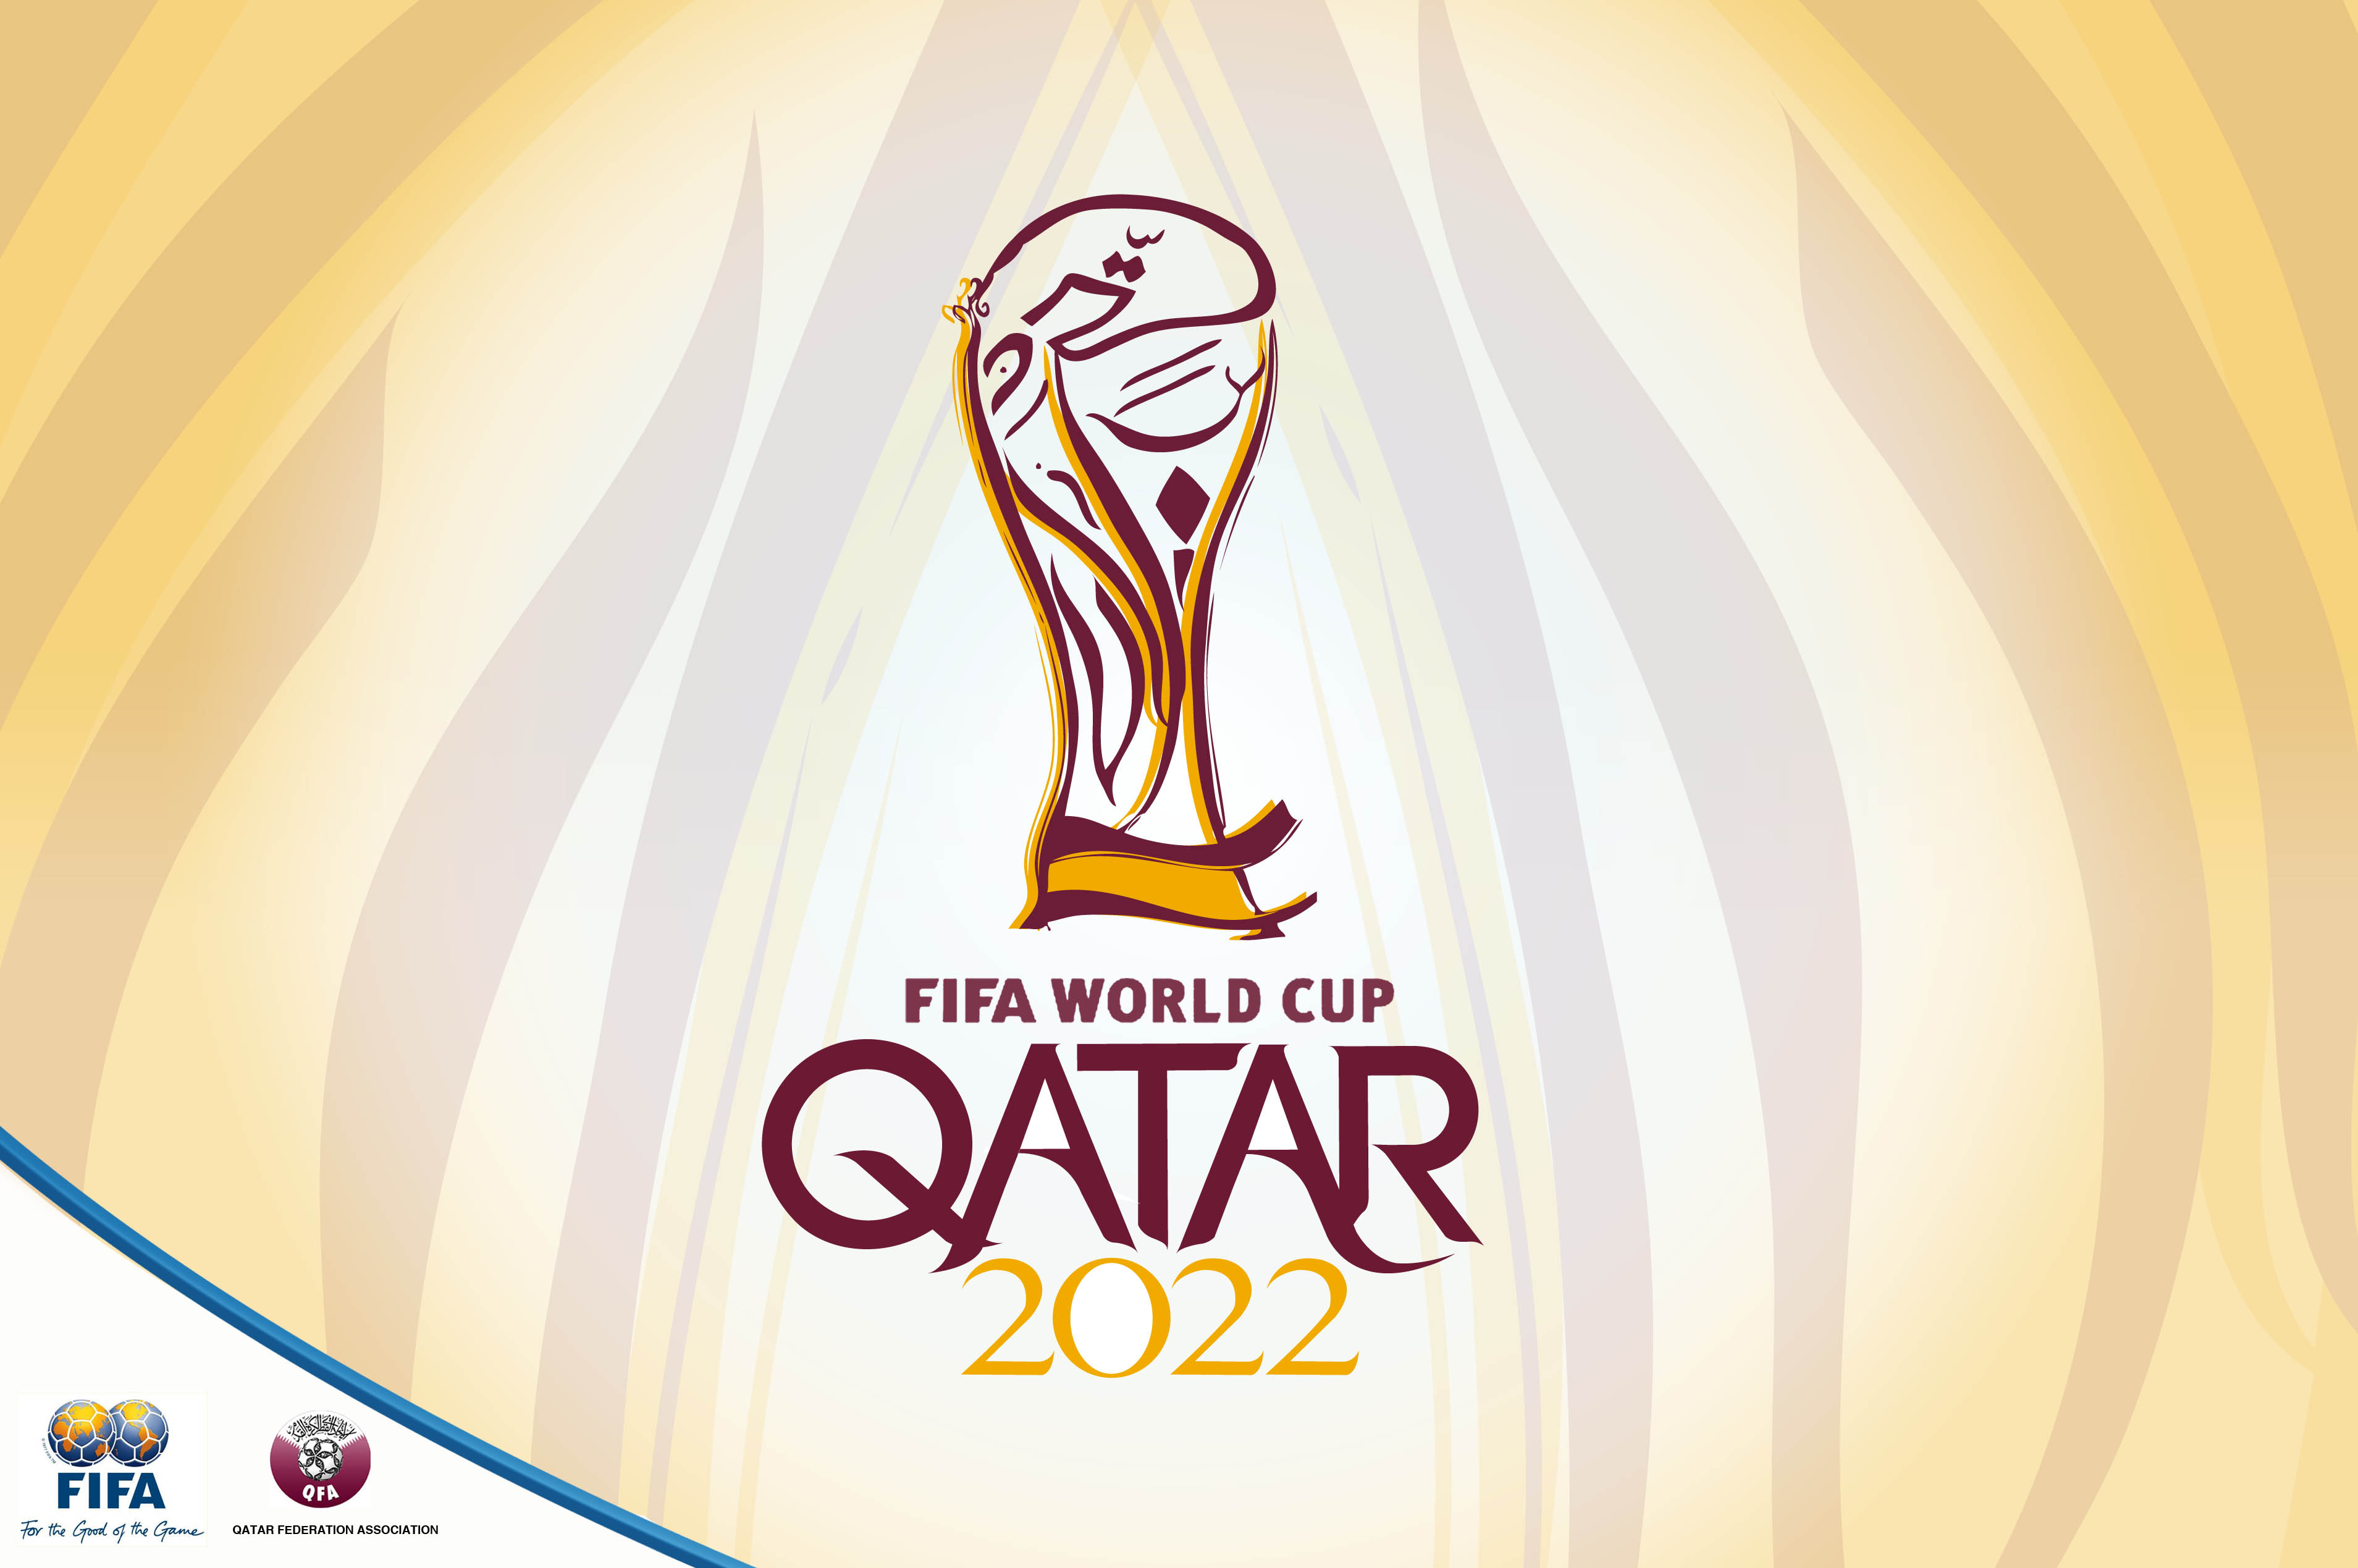 Qatar-2022-Client-image